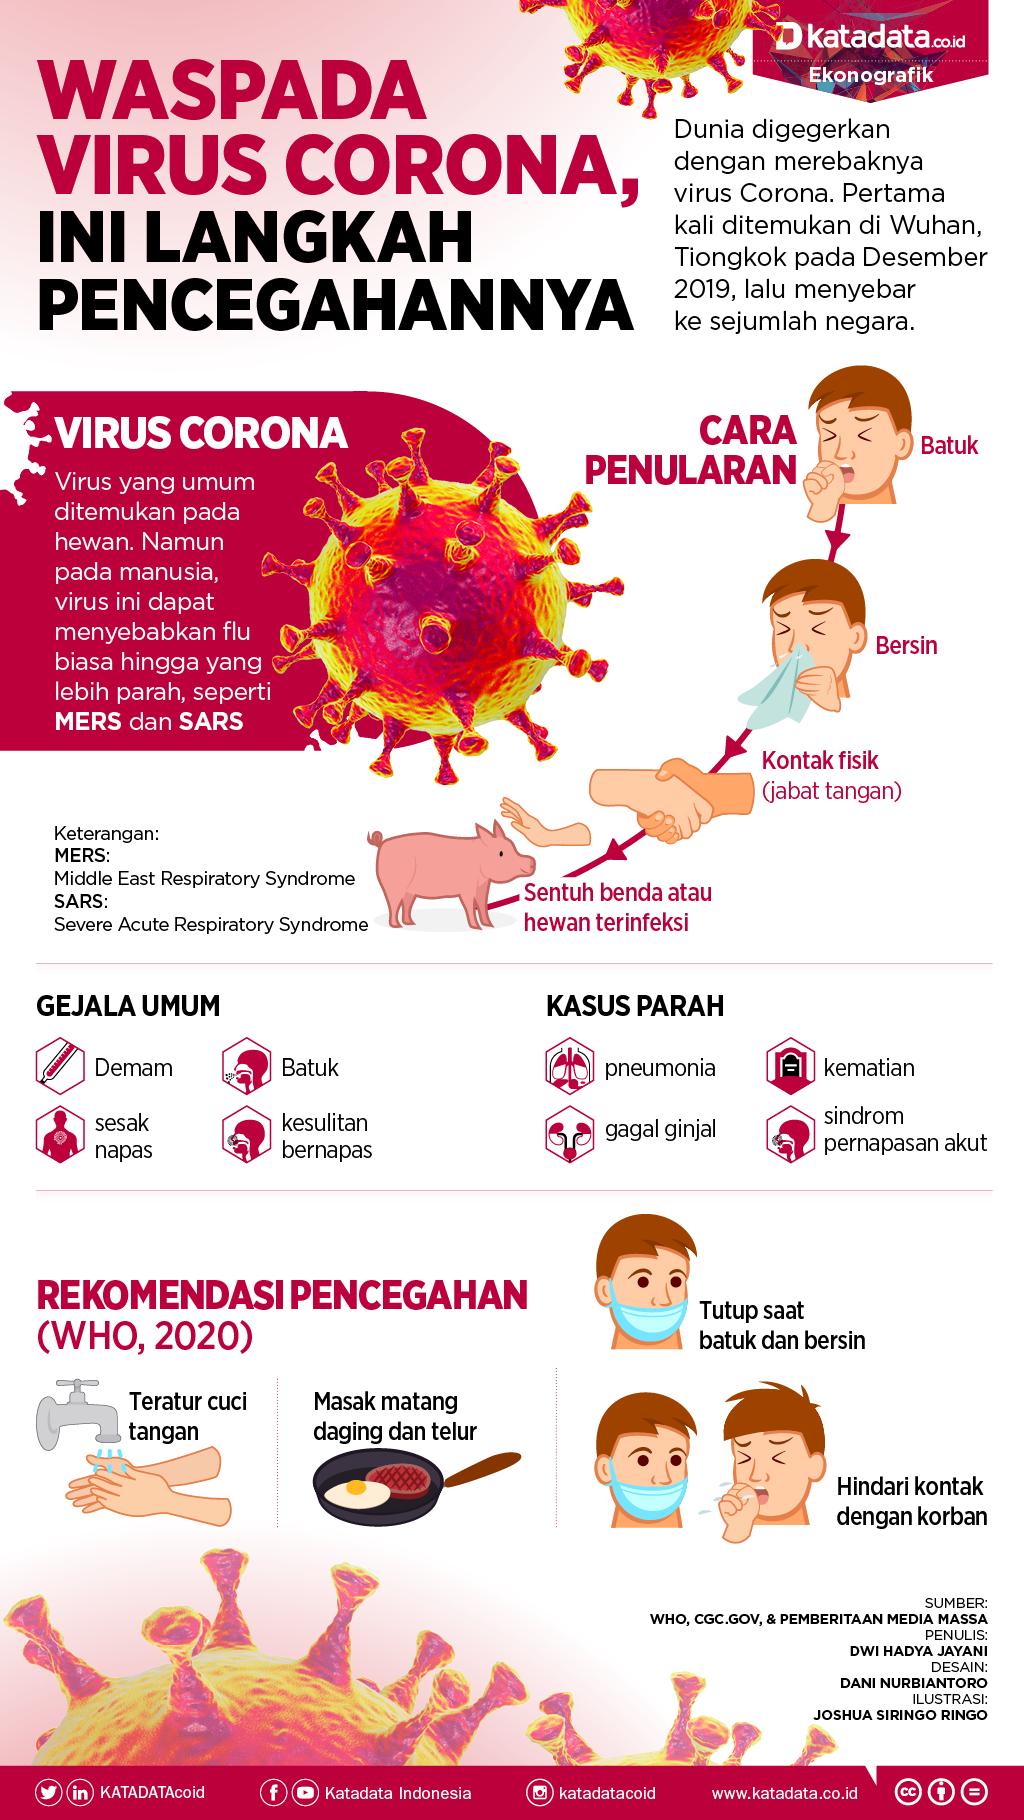 Waspada Virus Corona, Ini Langkah Pencegahannya : indonesia